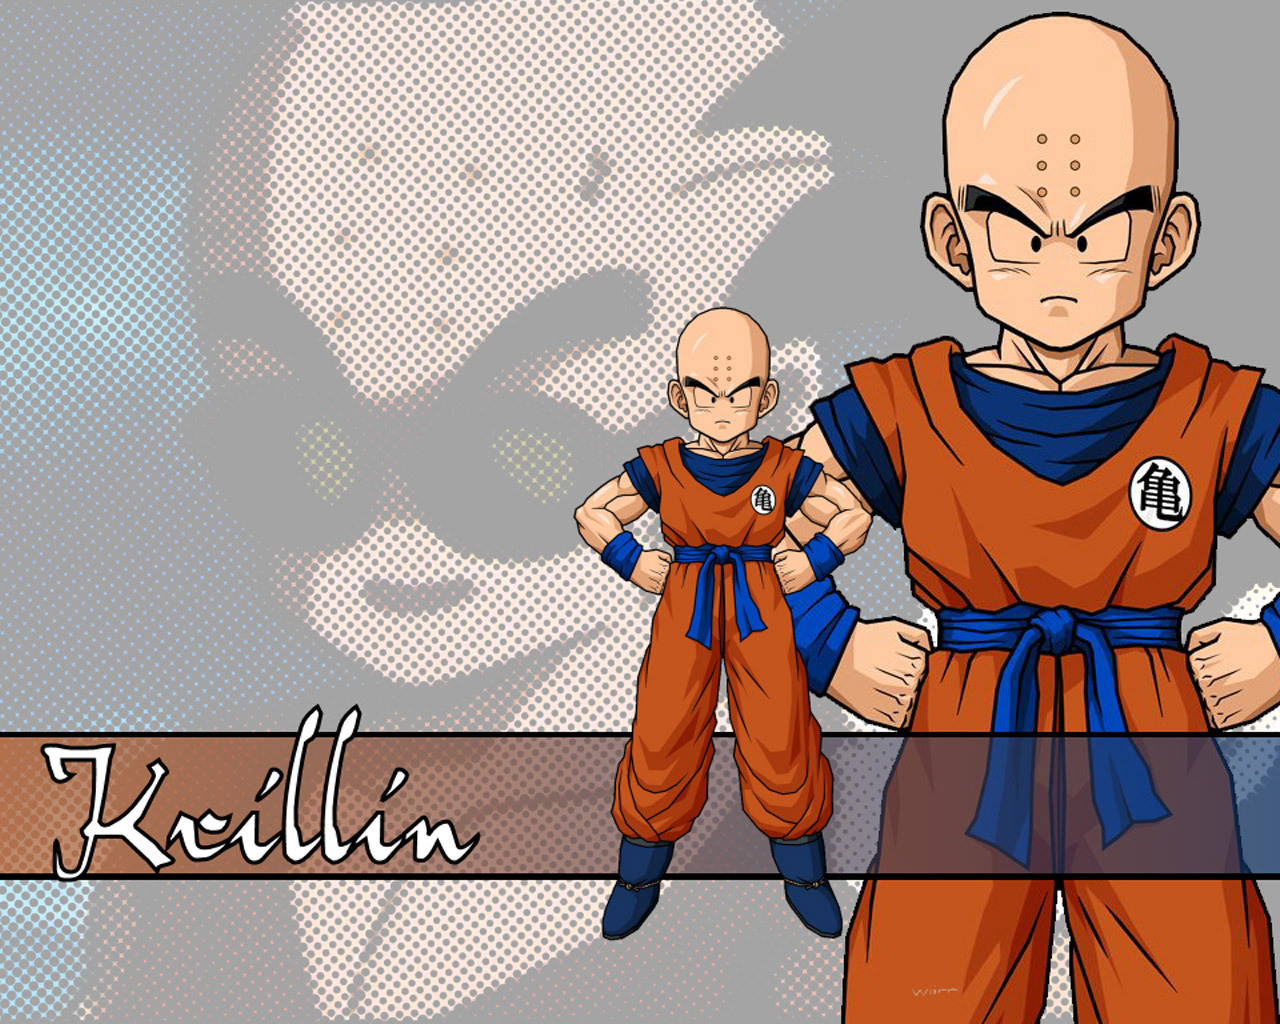 Krillin Dragon Ball Z Photo 19781183 Fanpop